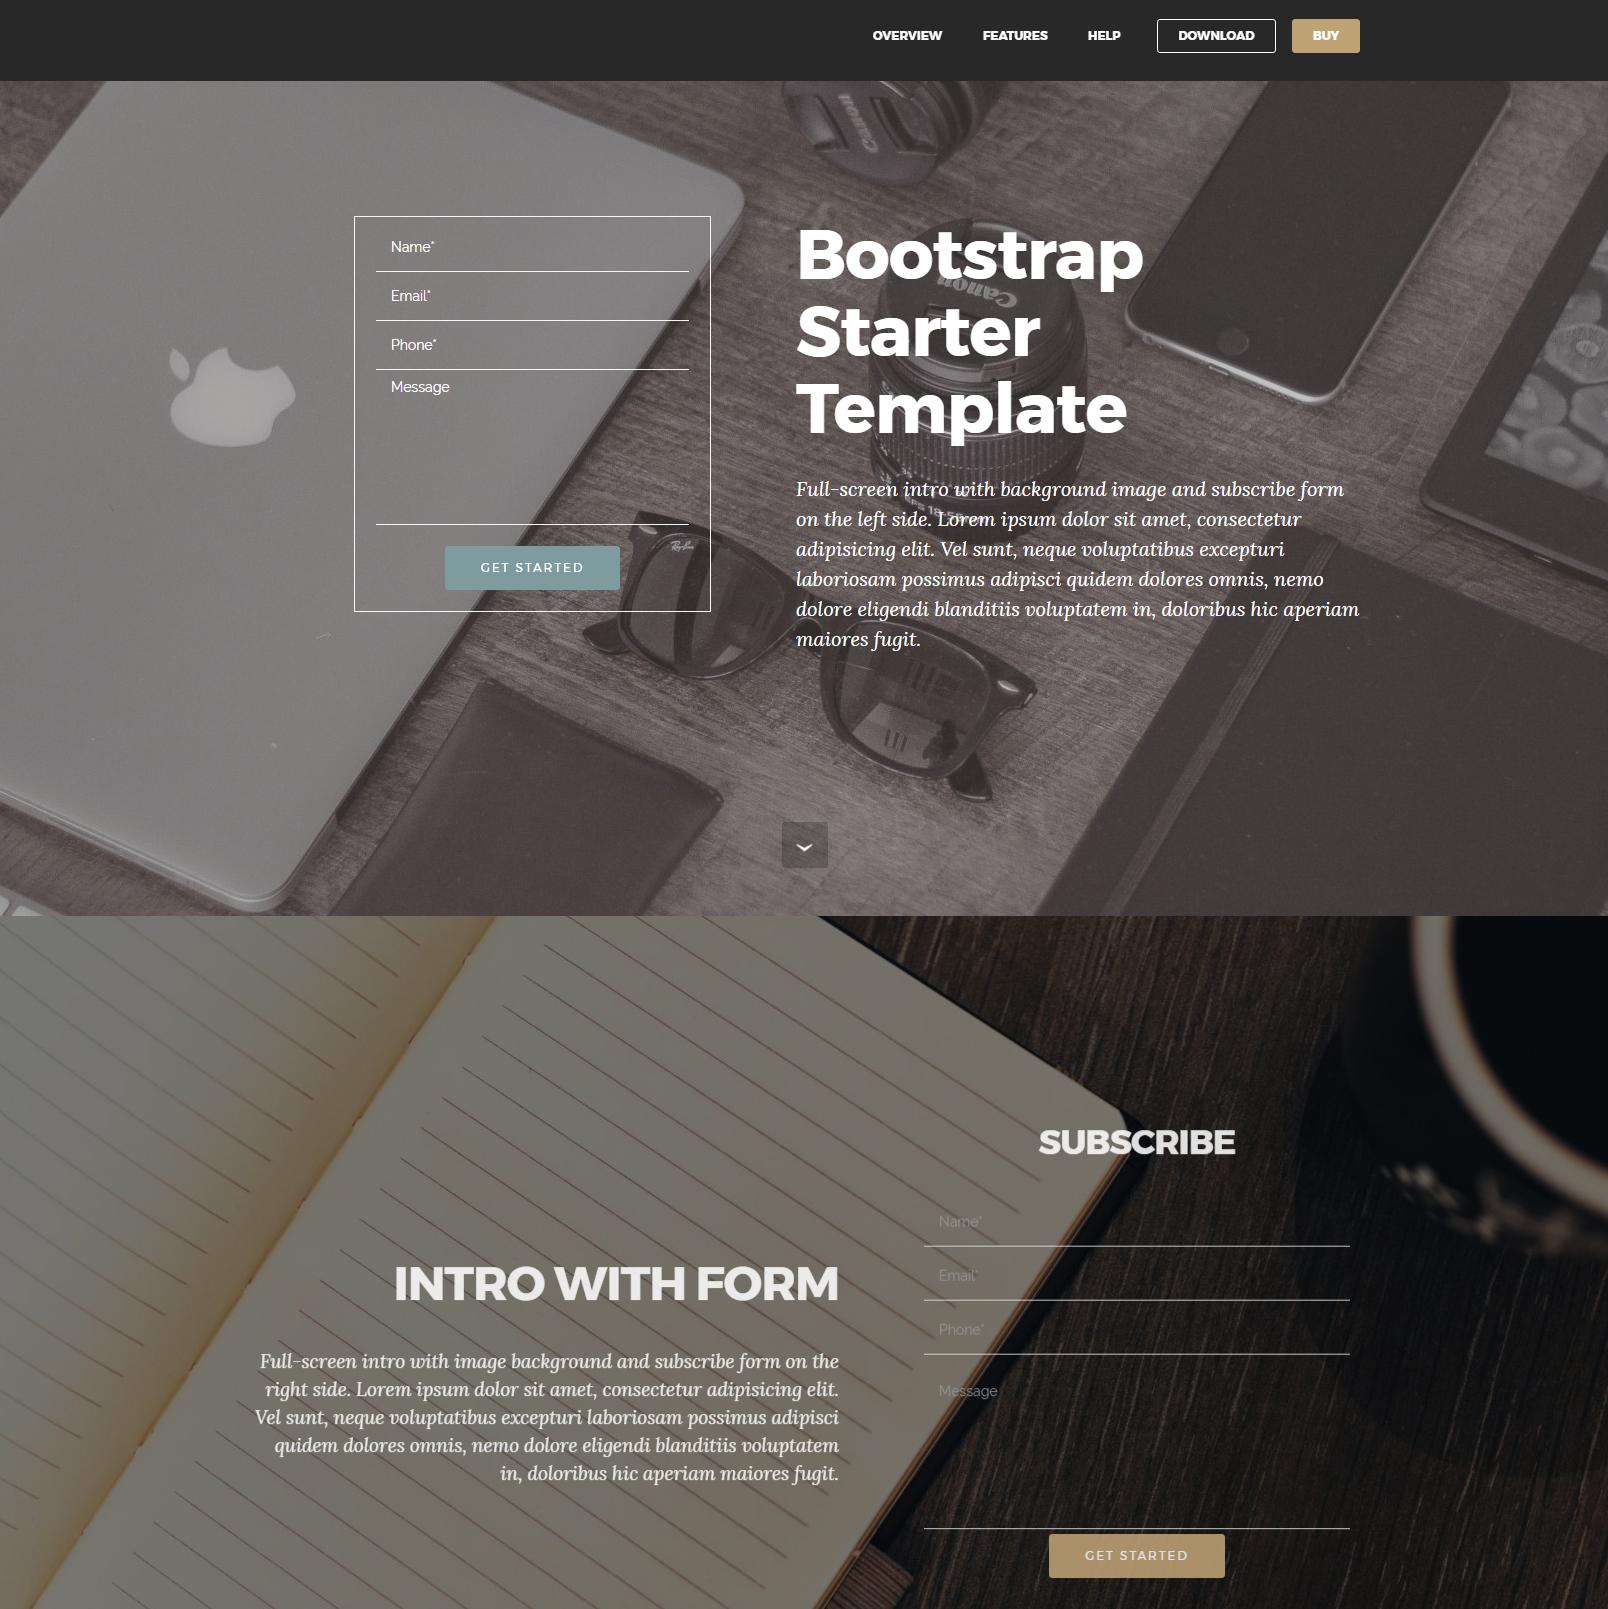 CSS3 Bootstrap Starter Templates